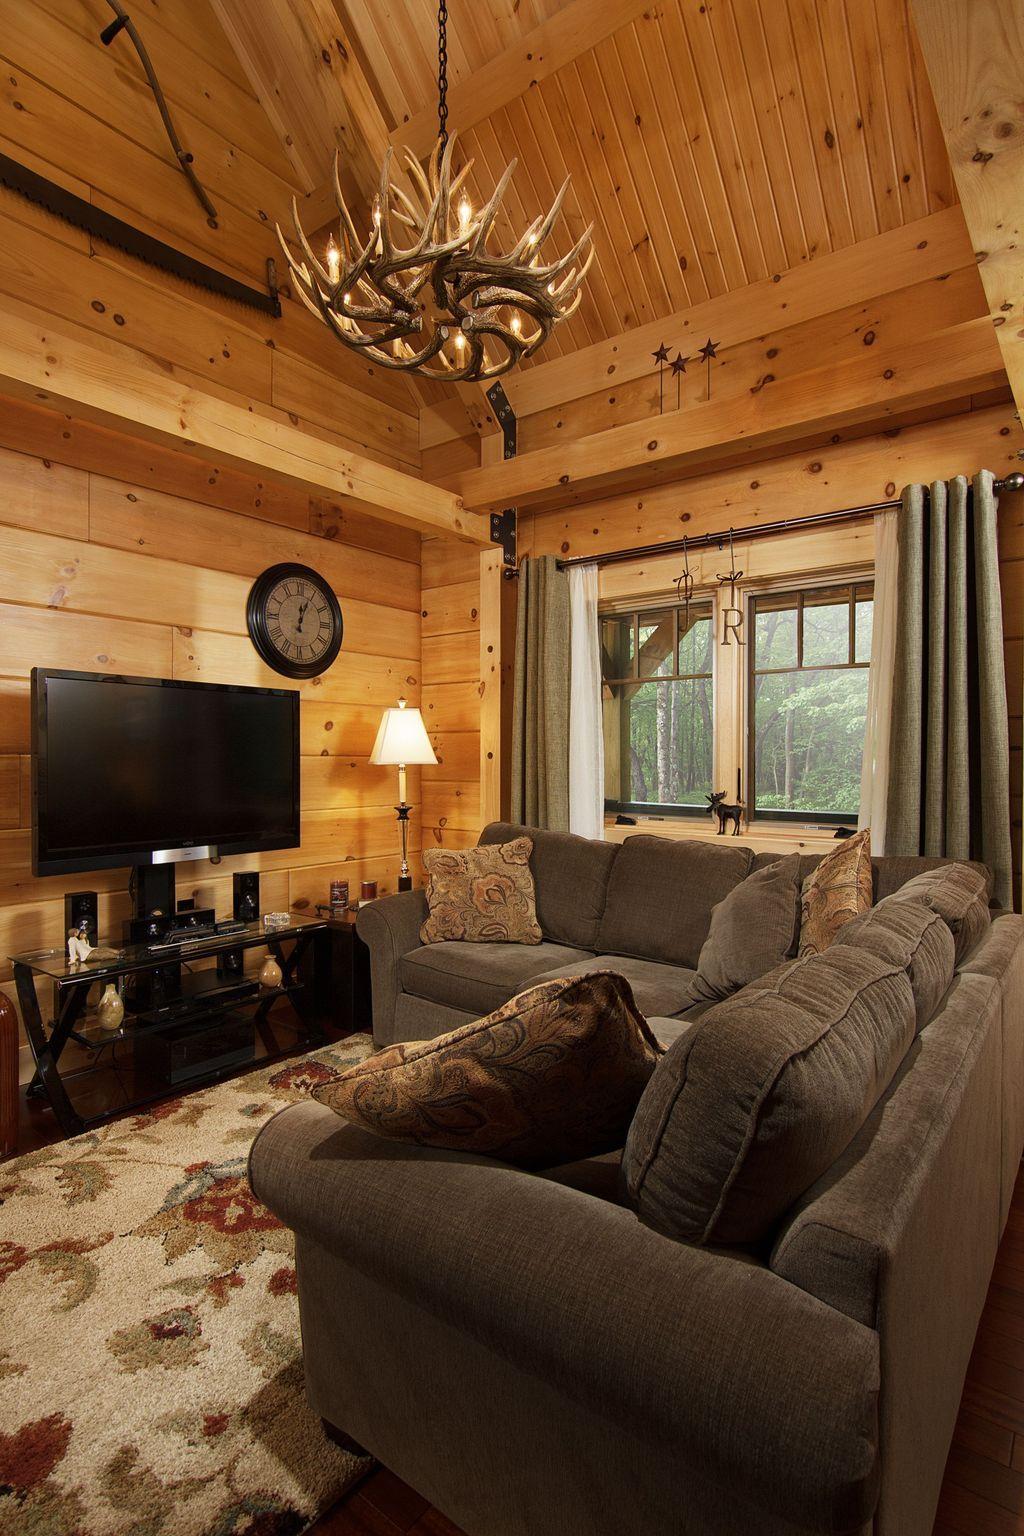 50 Best Small Log Cabin Homes Interior Decor Ideas in 2020 ...